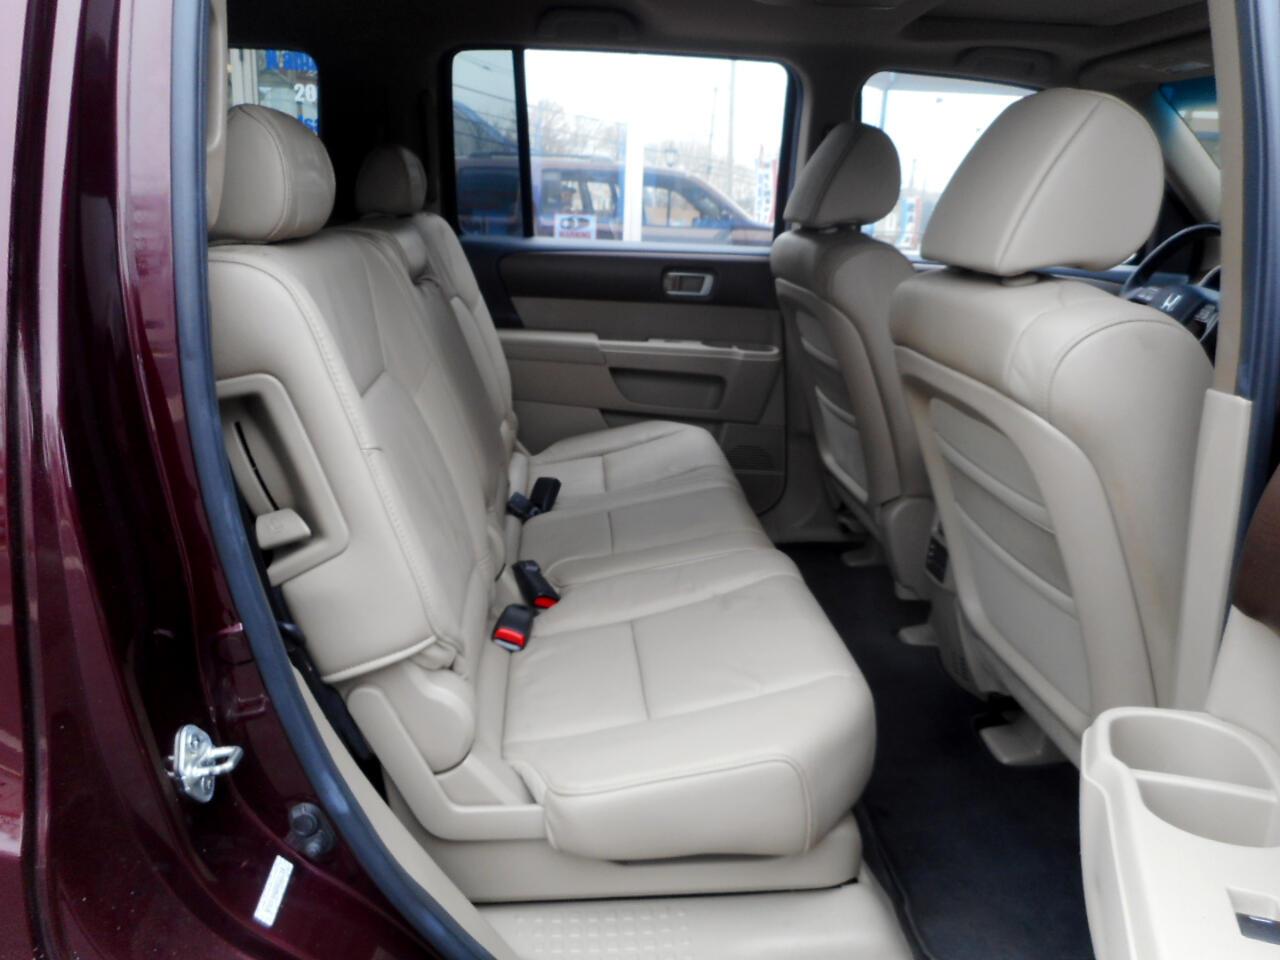 2010 Honda Pilot EX-L 4WD 5-Spd AT with DVD